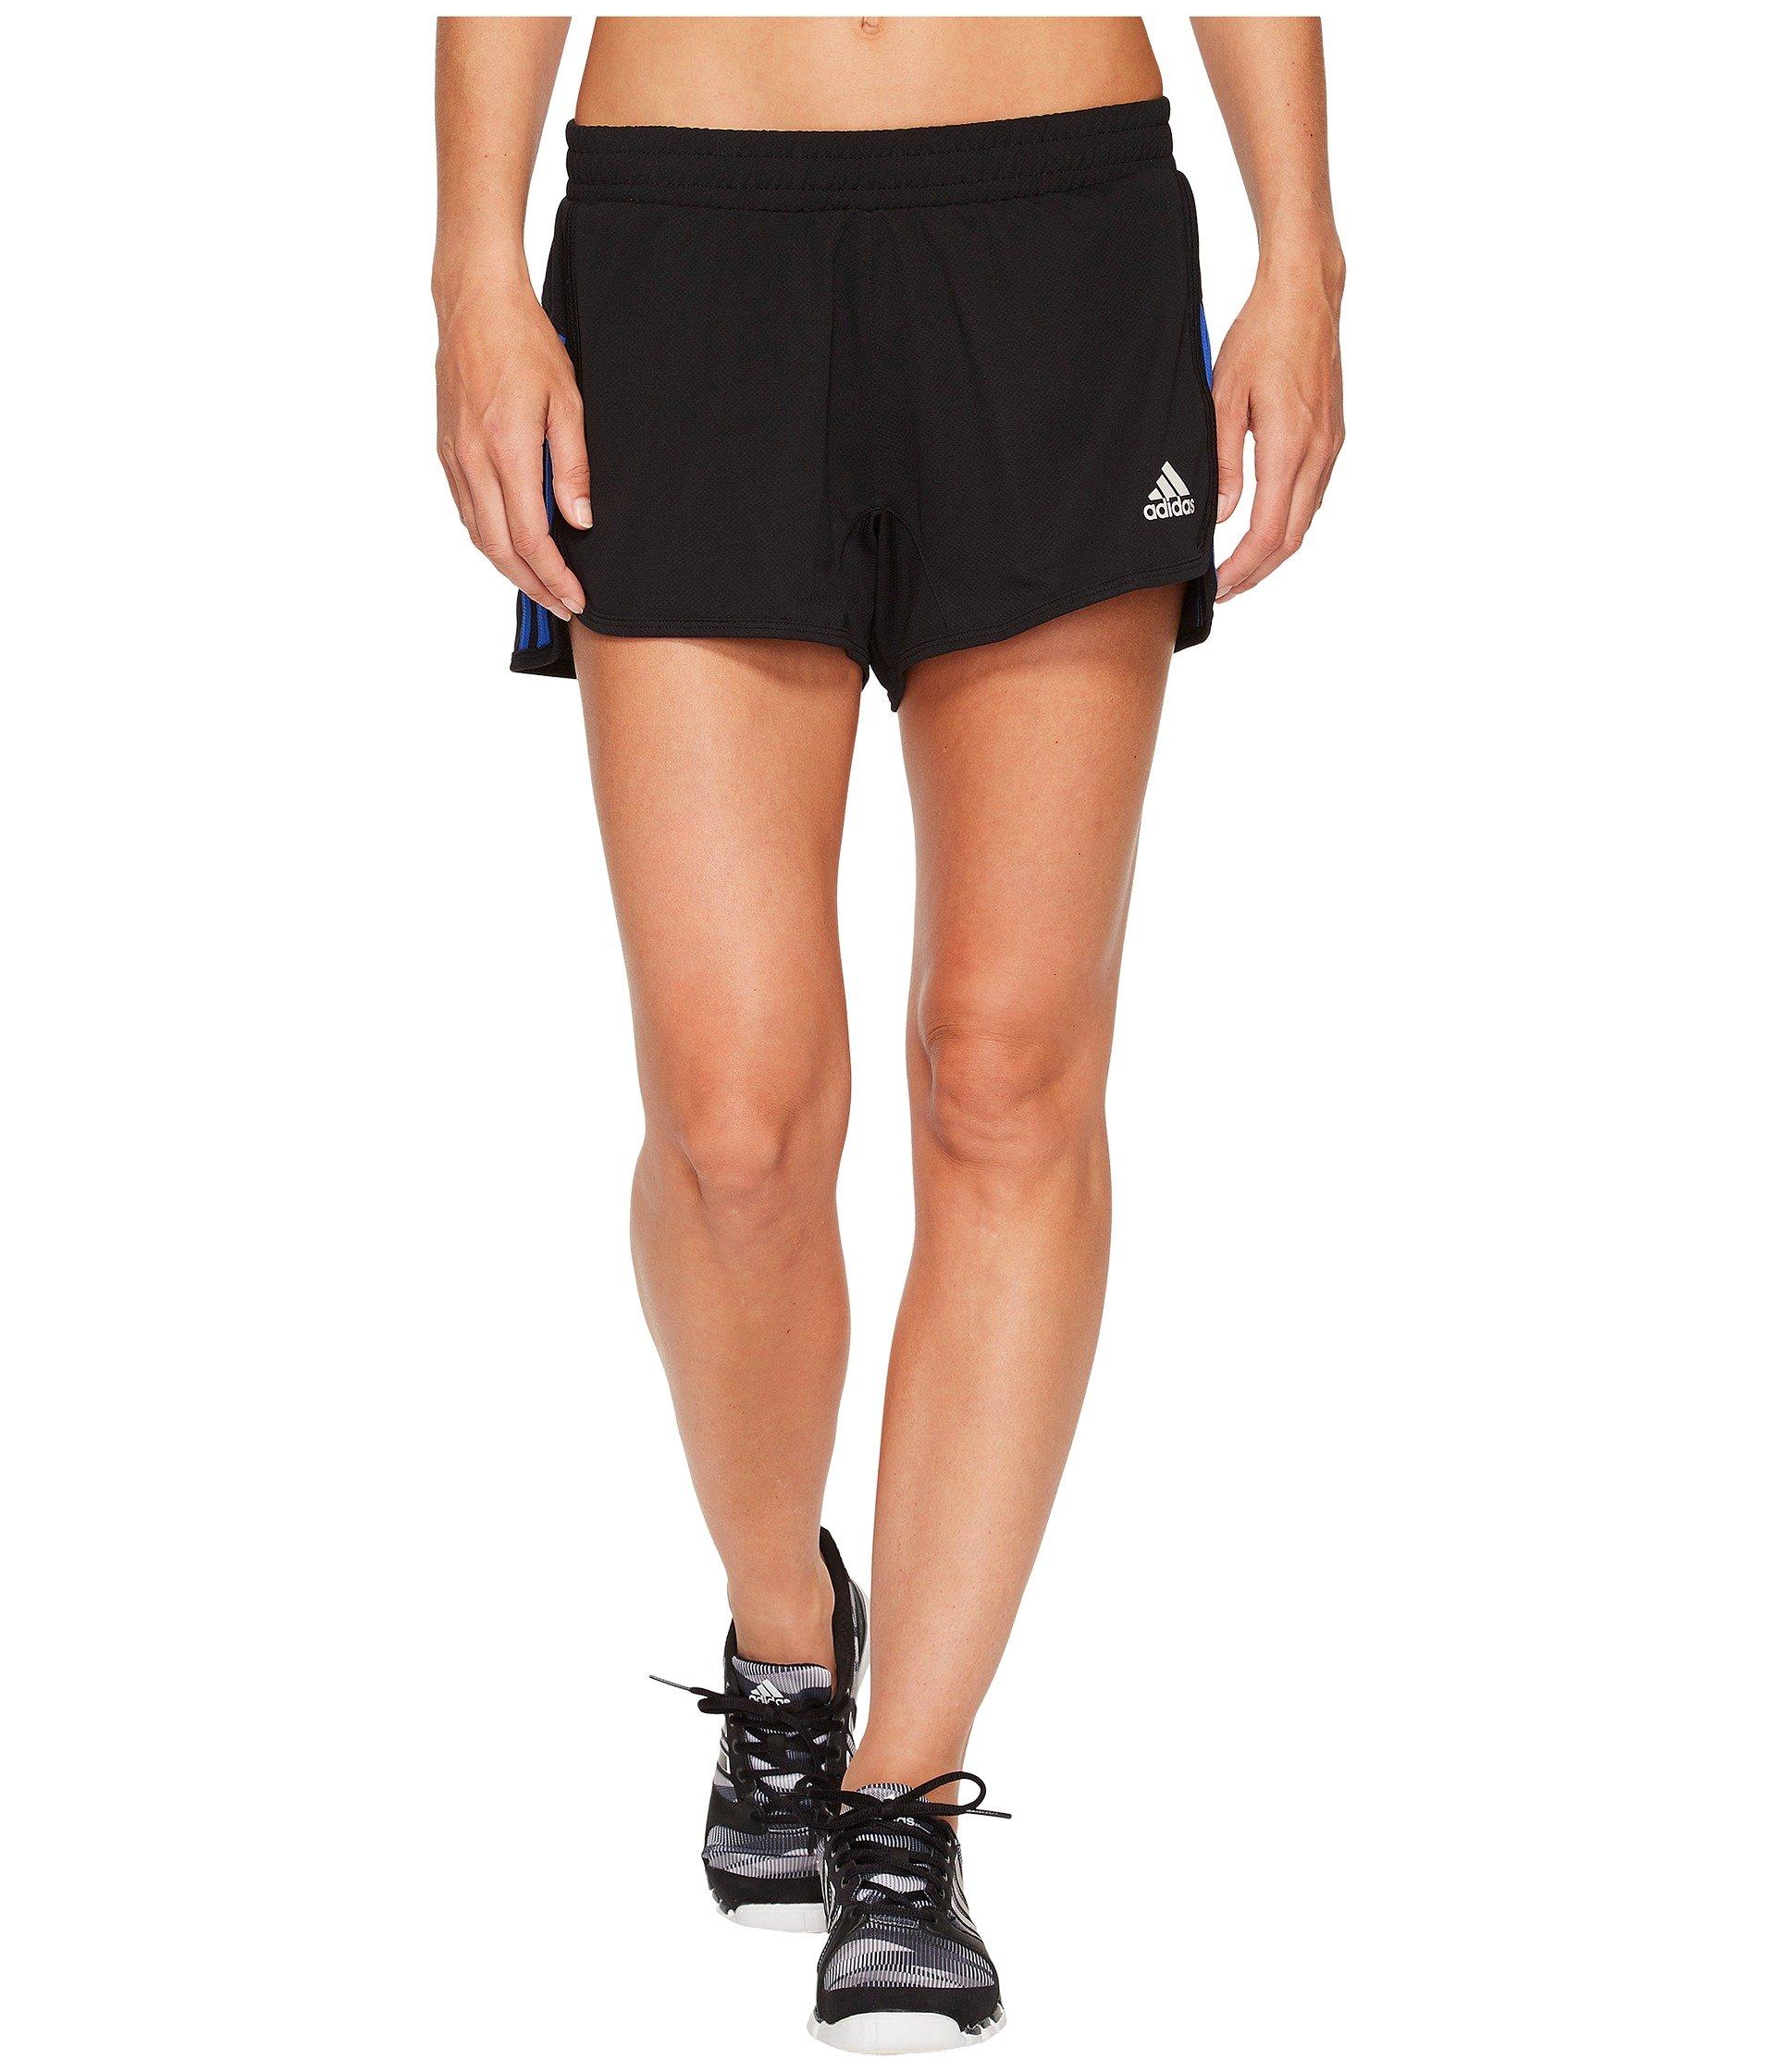 adidas Women's D2m Knit Shorts Black/High-Res Blue Large 3